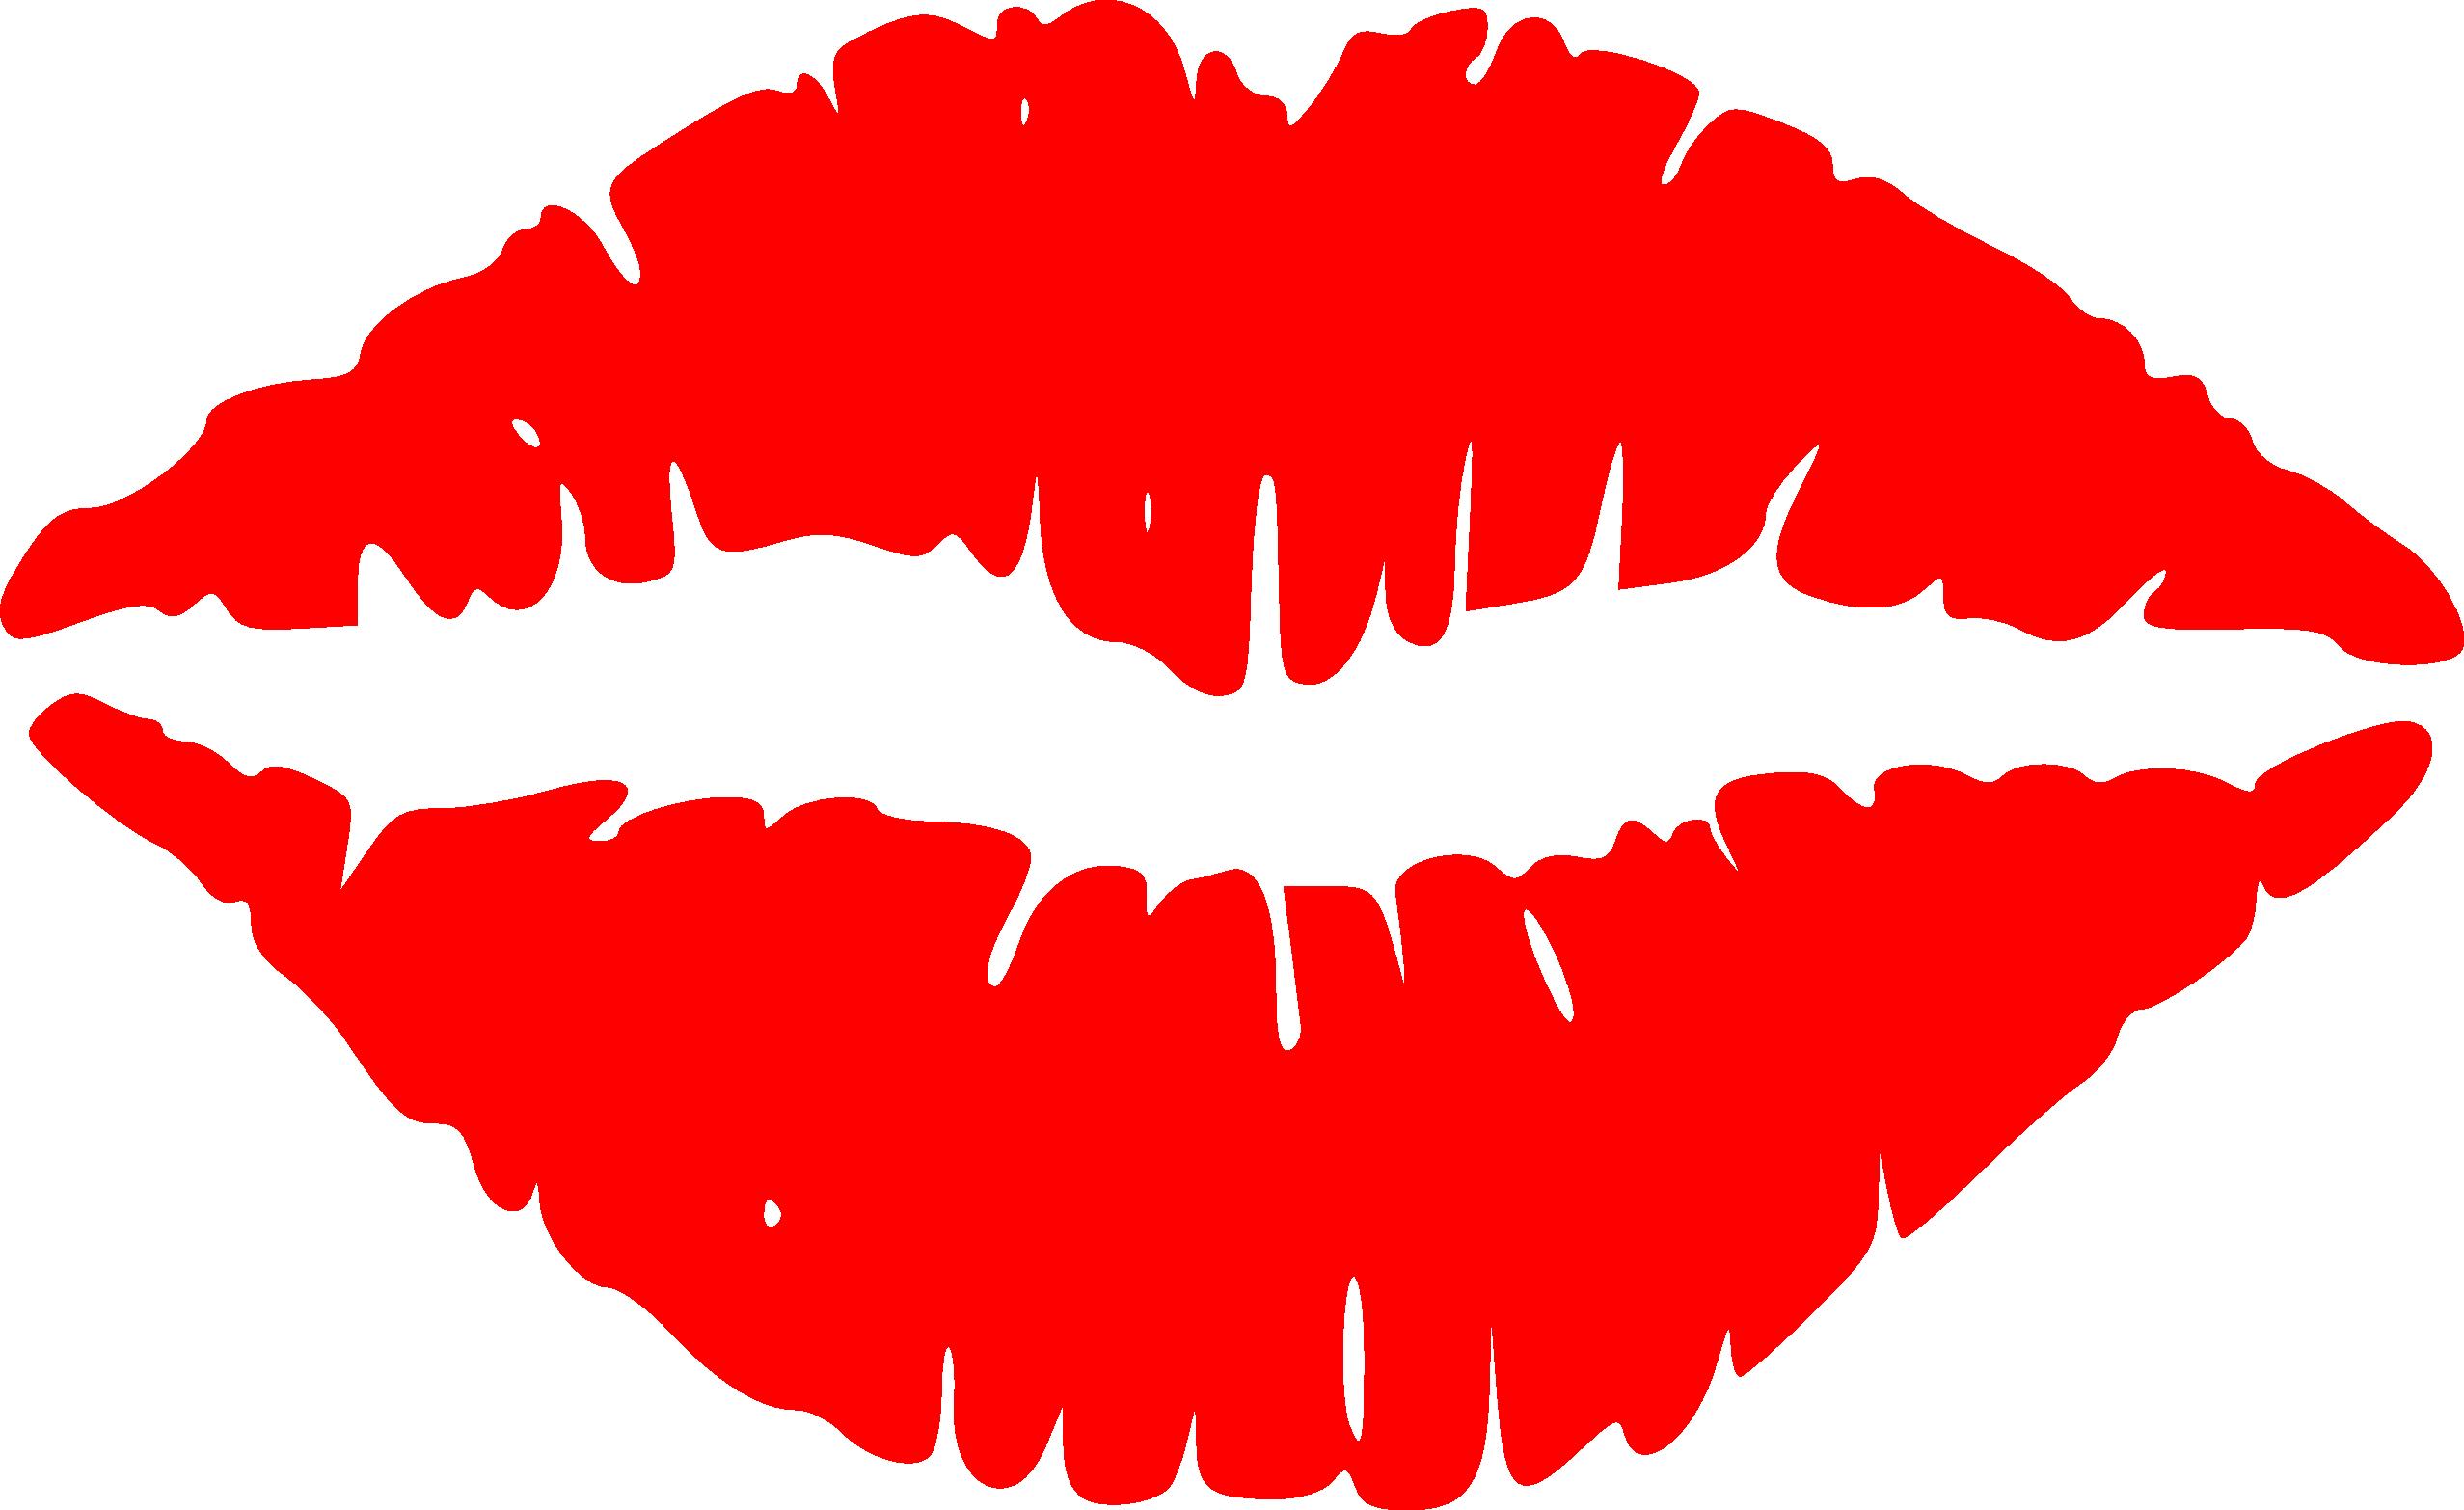 Lips clipart turquoise. Albuquerque the magazine uncategorized